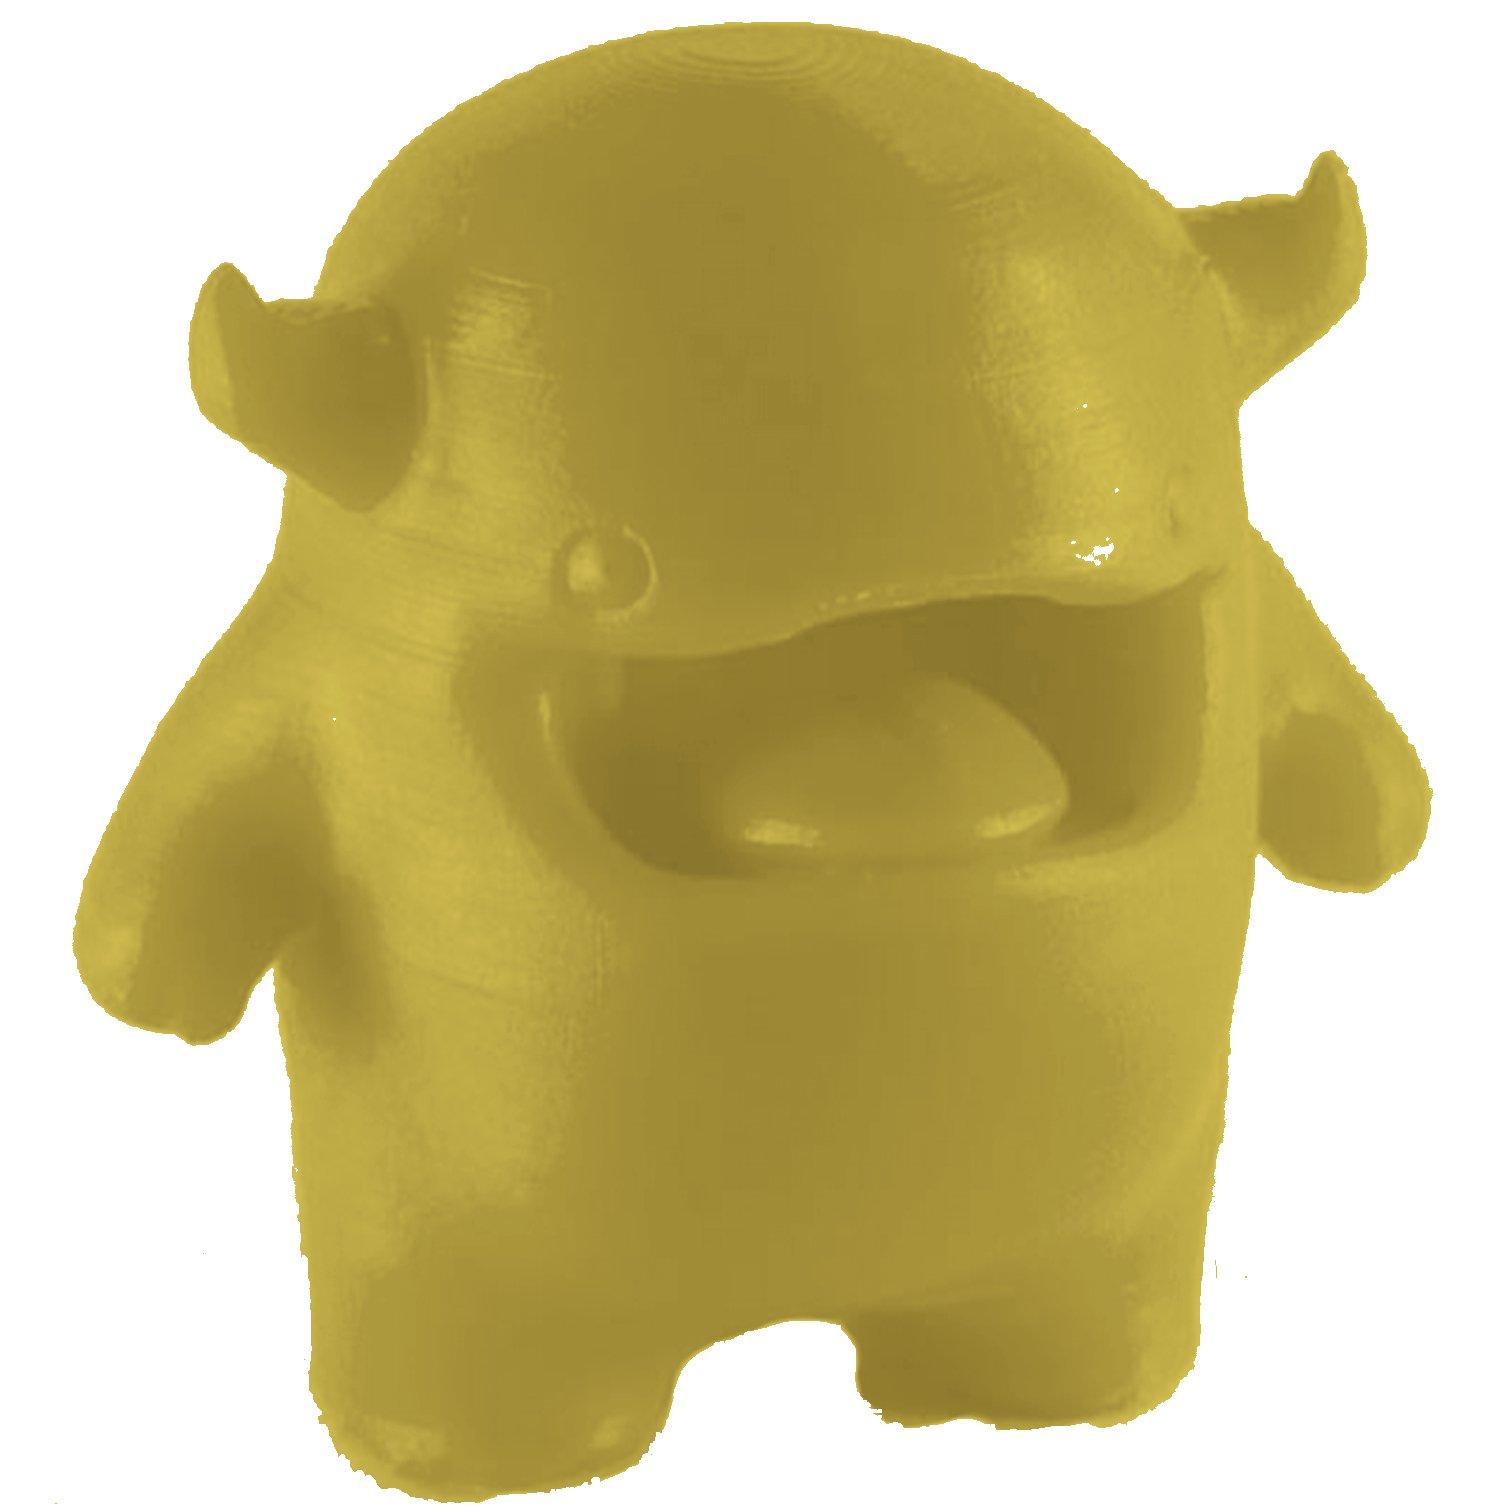 MakerJuice Yellow G+ UV 3D Plastic Printing Resin for SLA and DLP Printers (one 500 mL bottle).